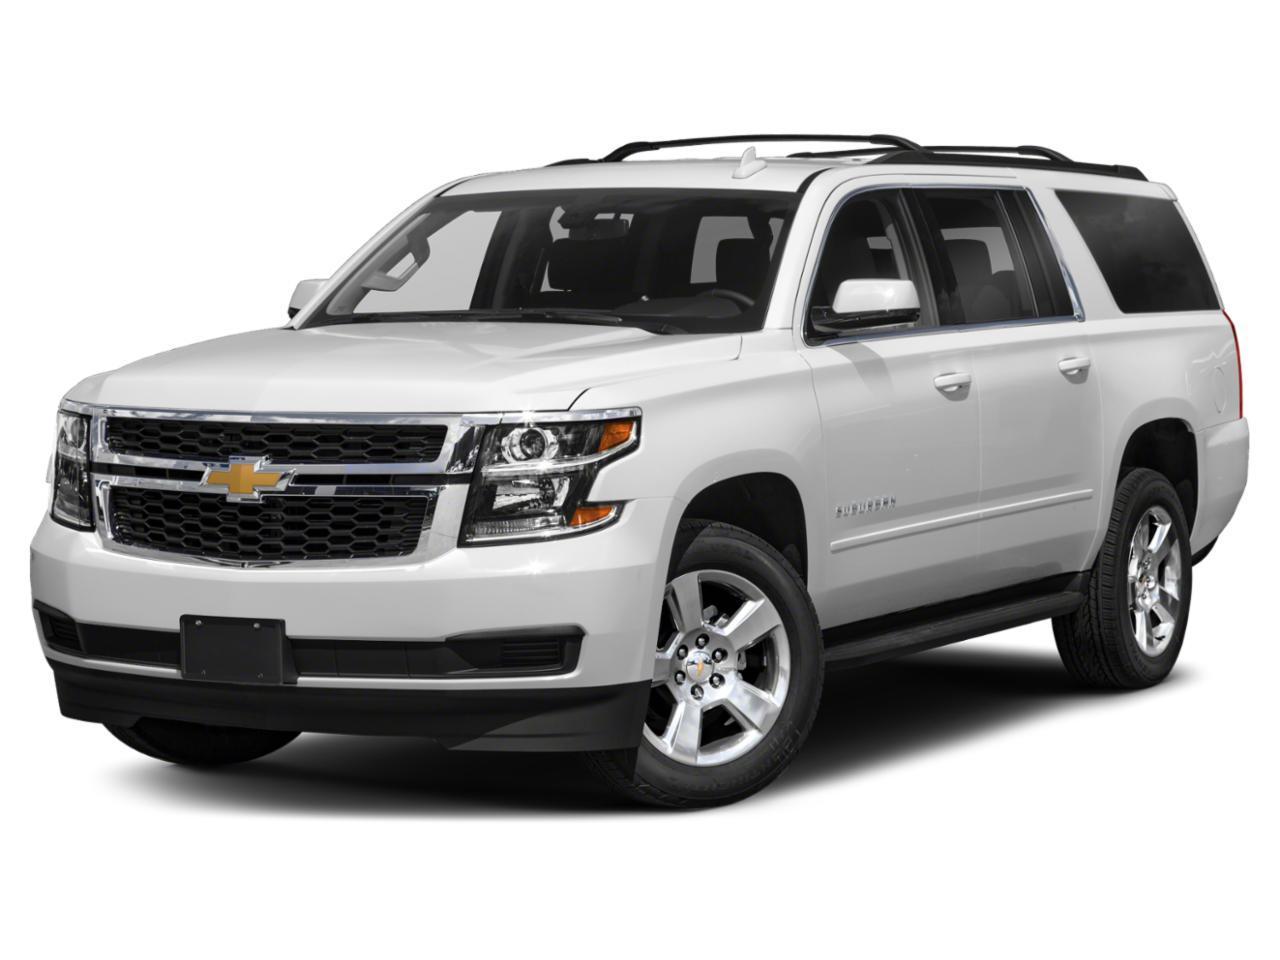 2020 Chevrolet Suburban Vehicle Photo in Redding, CA 96002